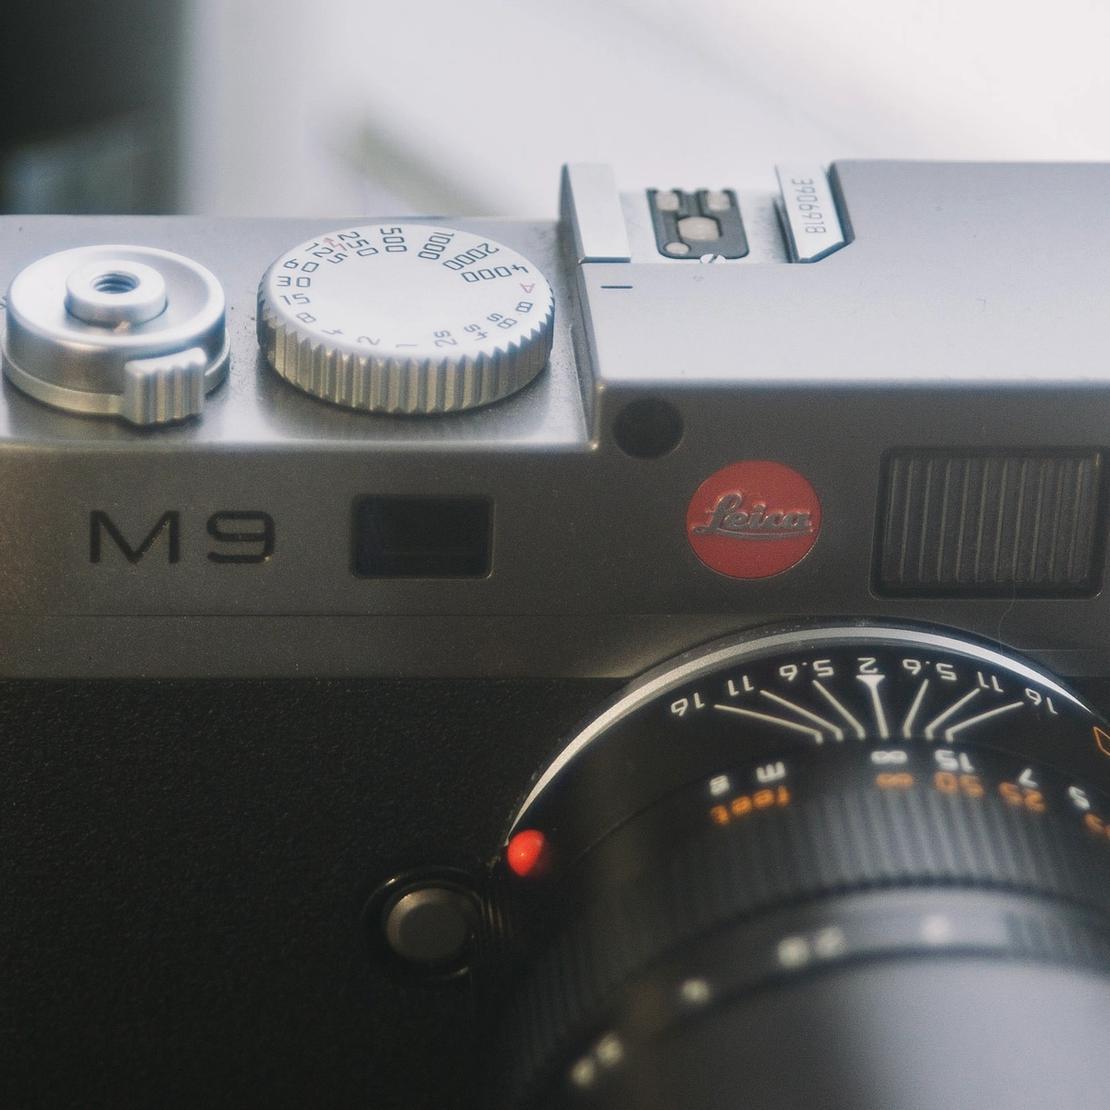 Closeup photo of Leica M9.